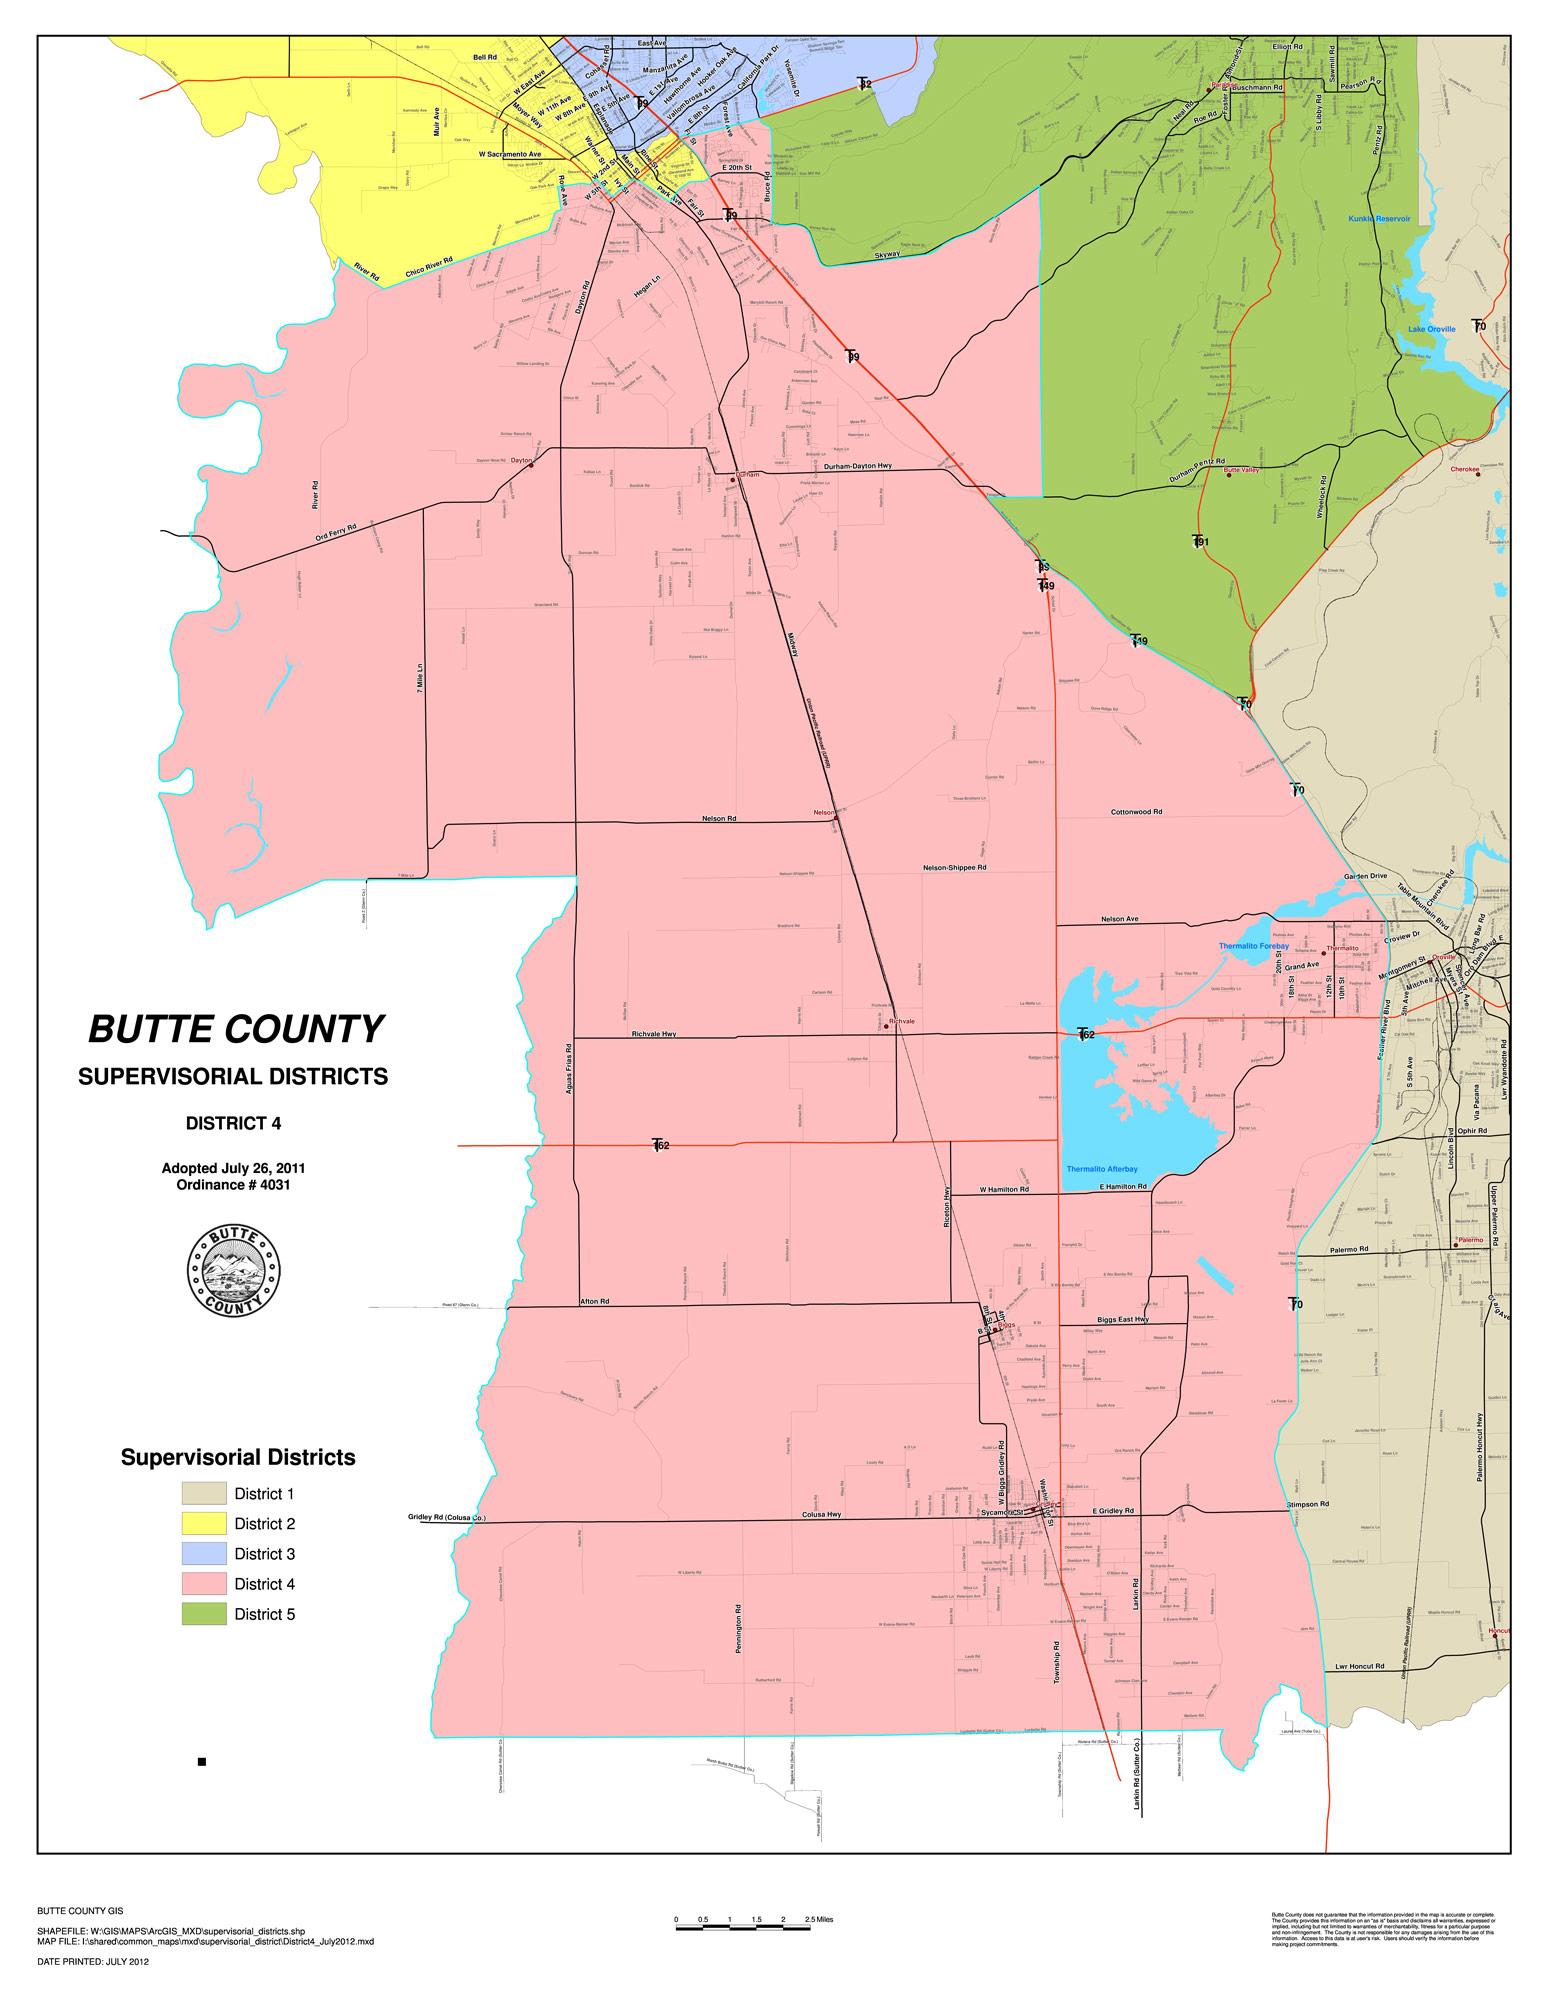 district-4-map.jpg